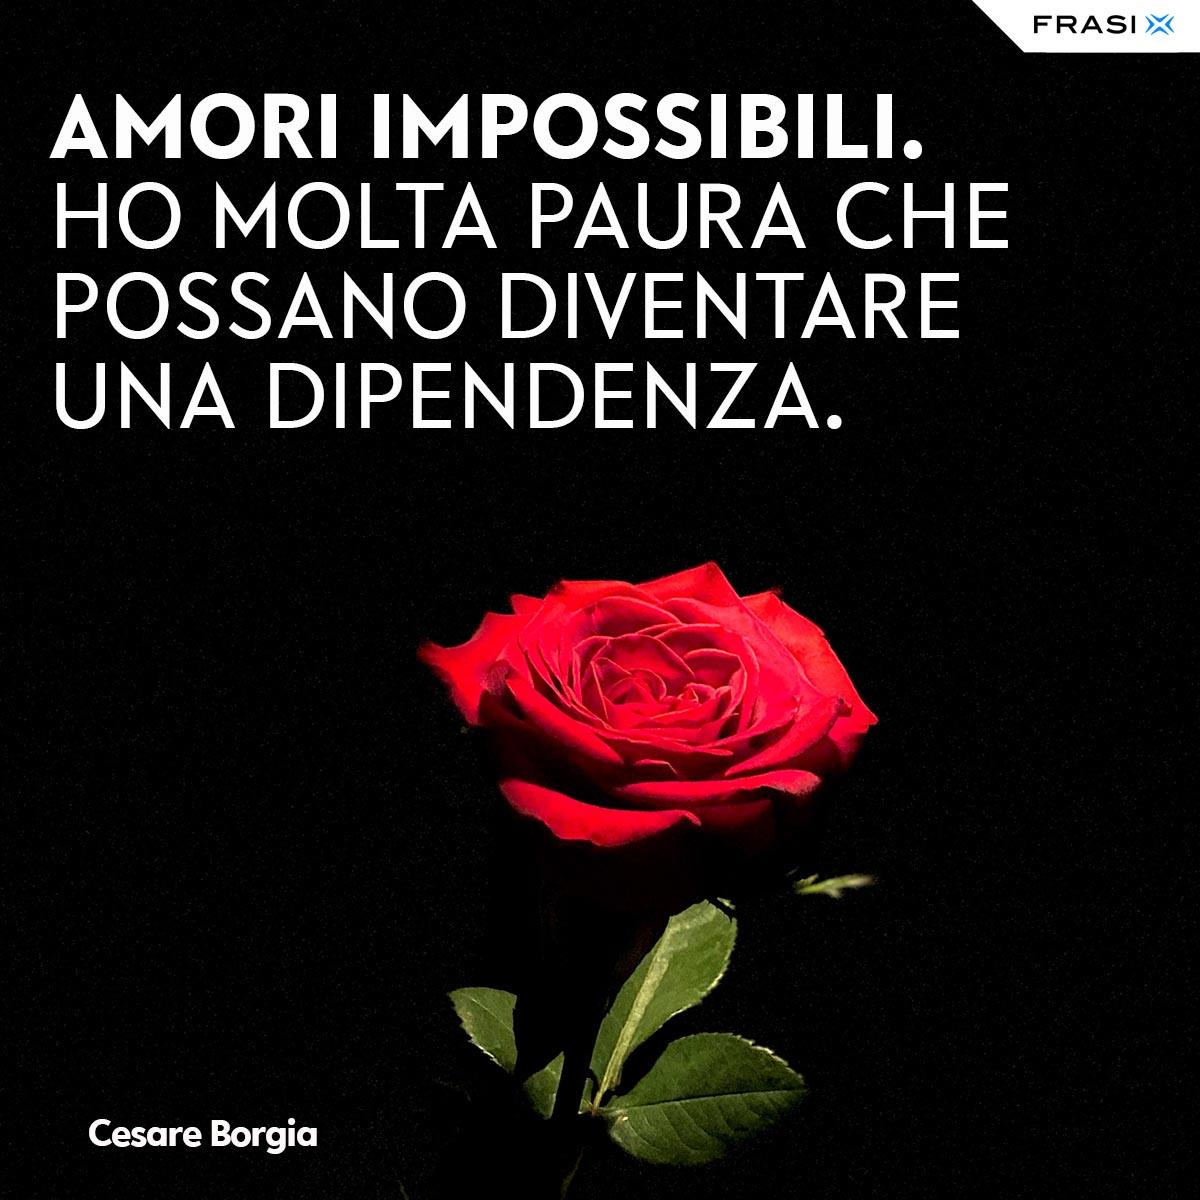 Aforismi amore impossibile Cesare Borgia